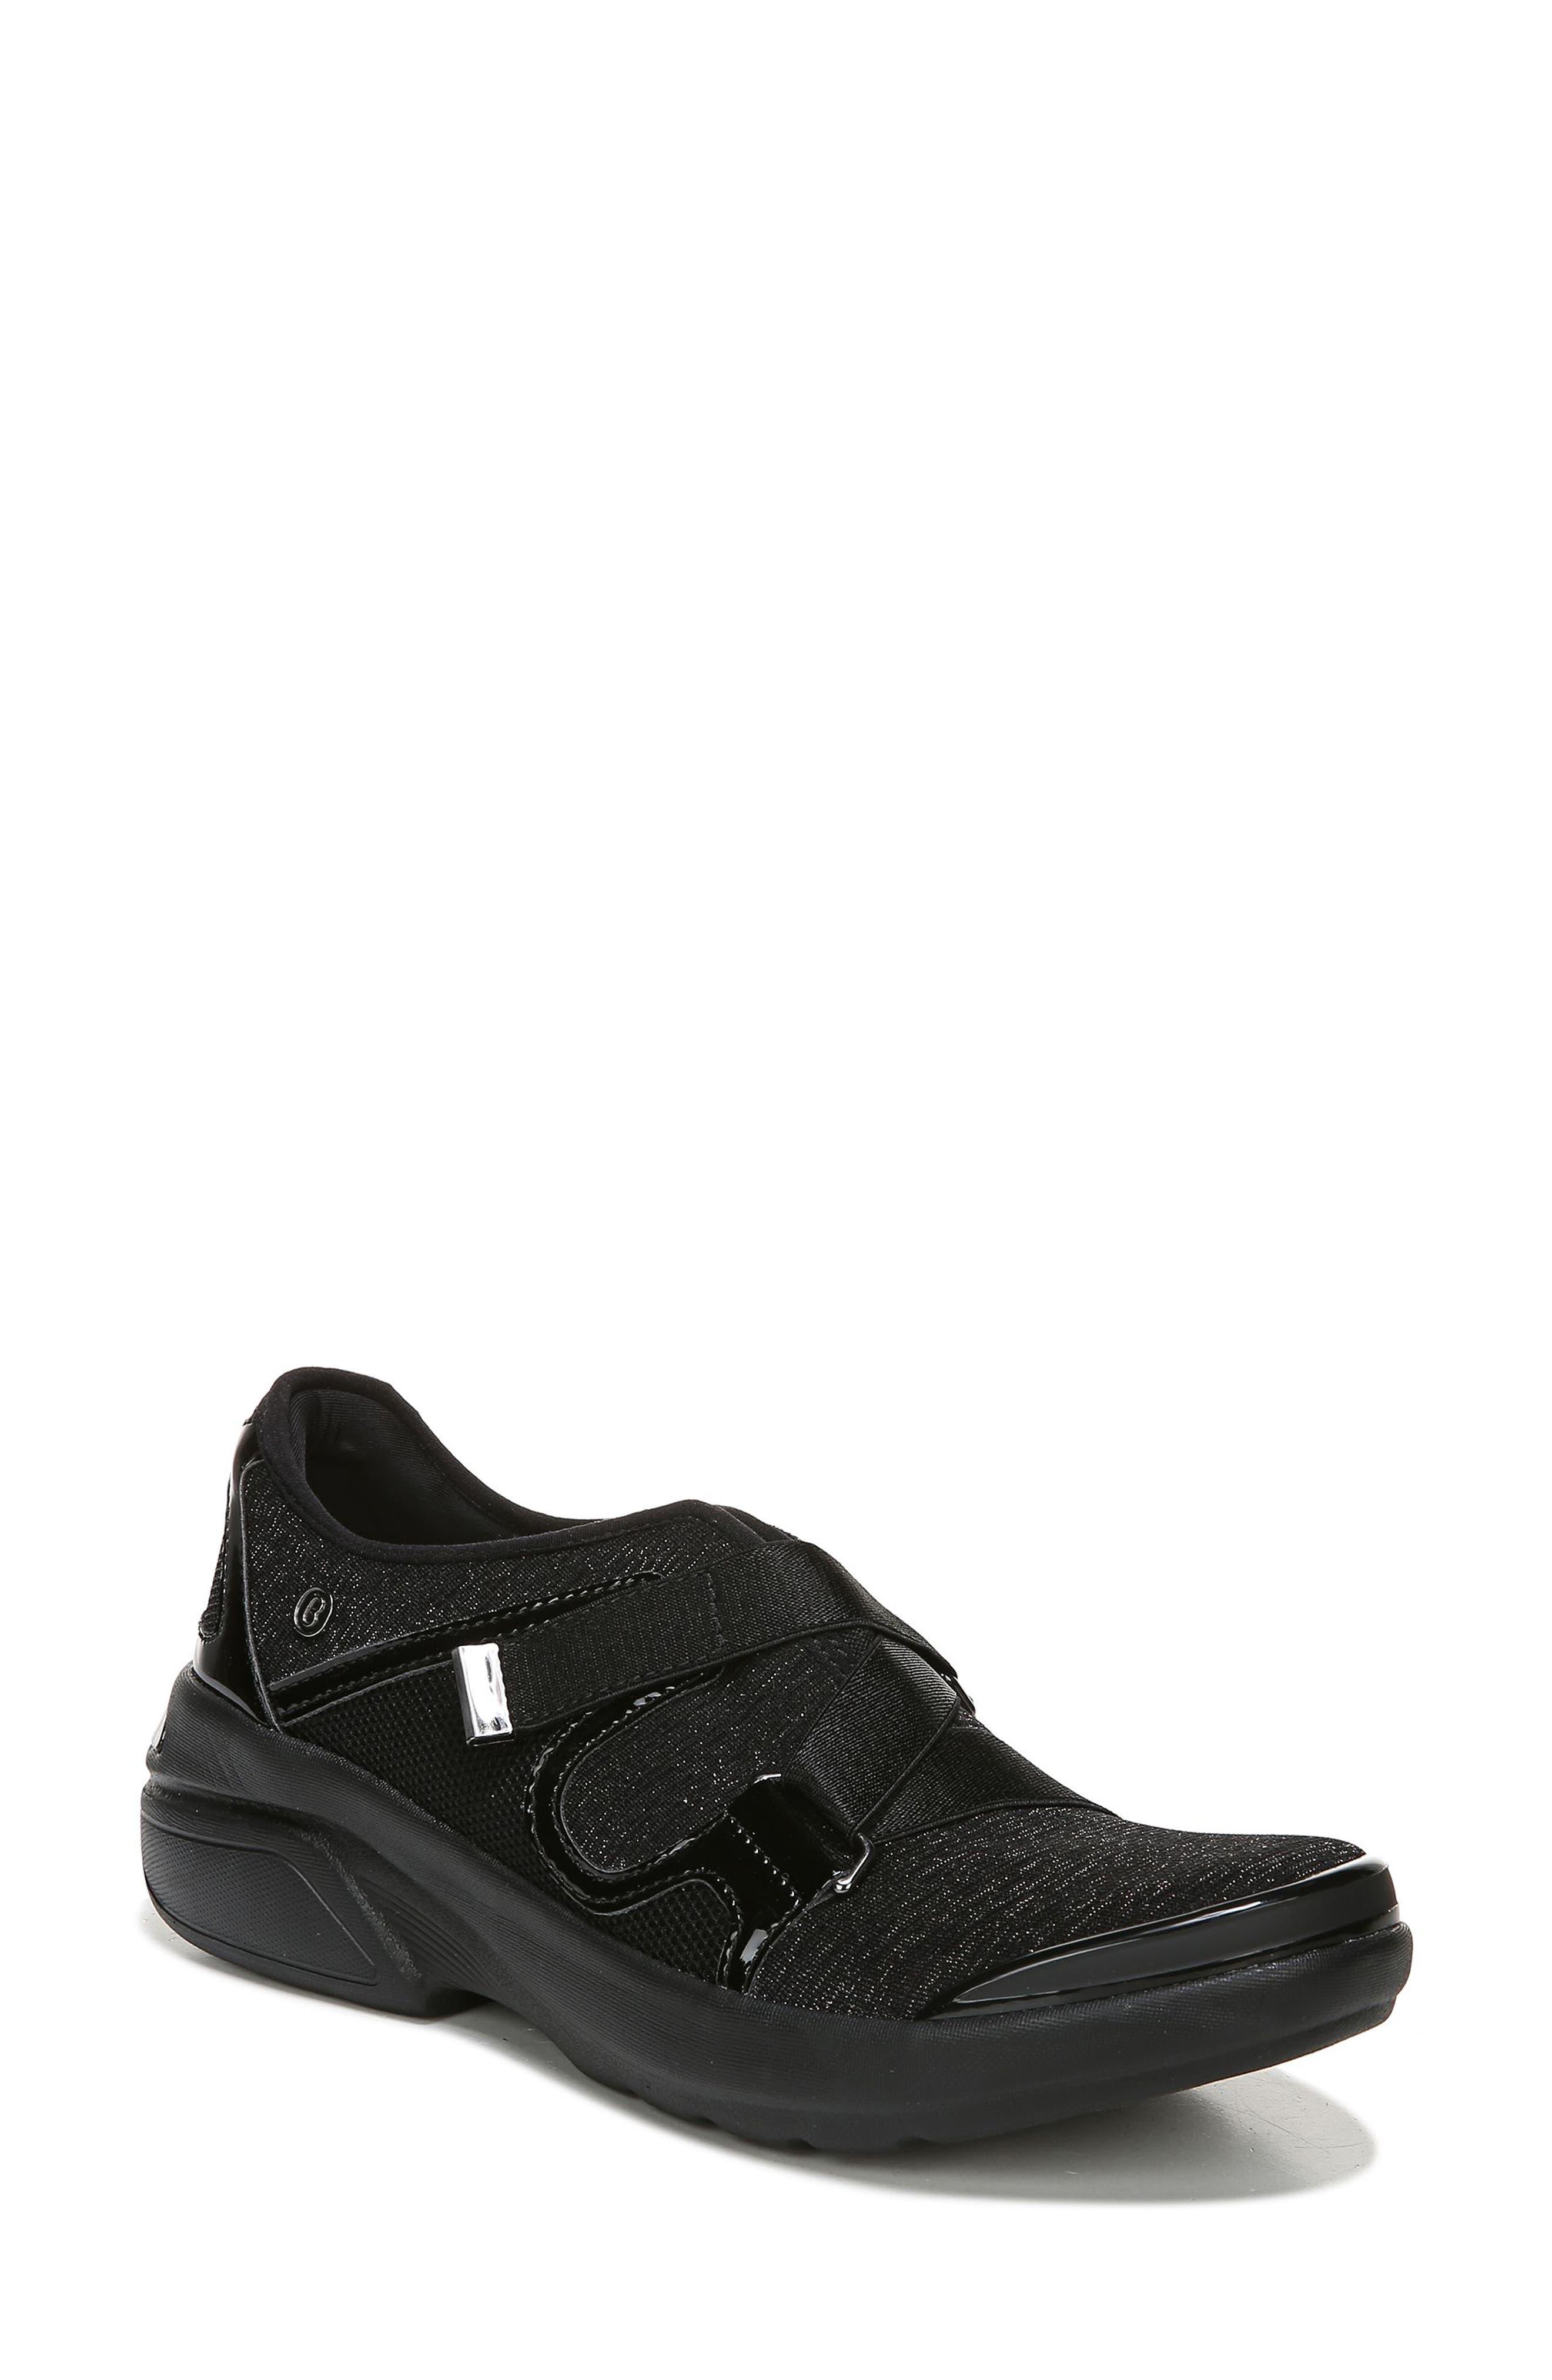 Offbeat Slip-On Sneaker